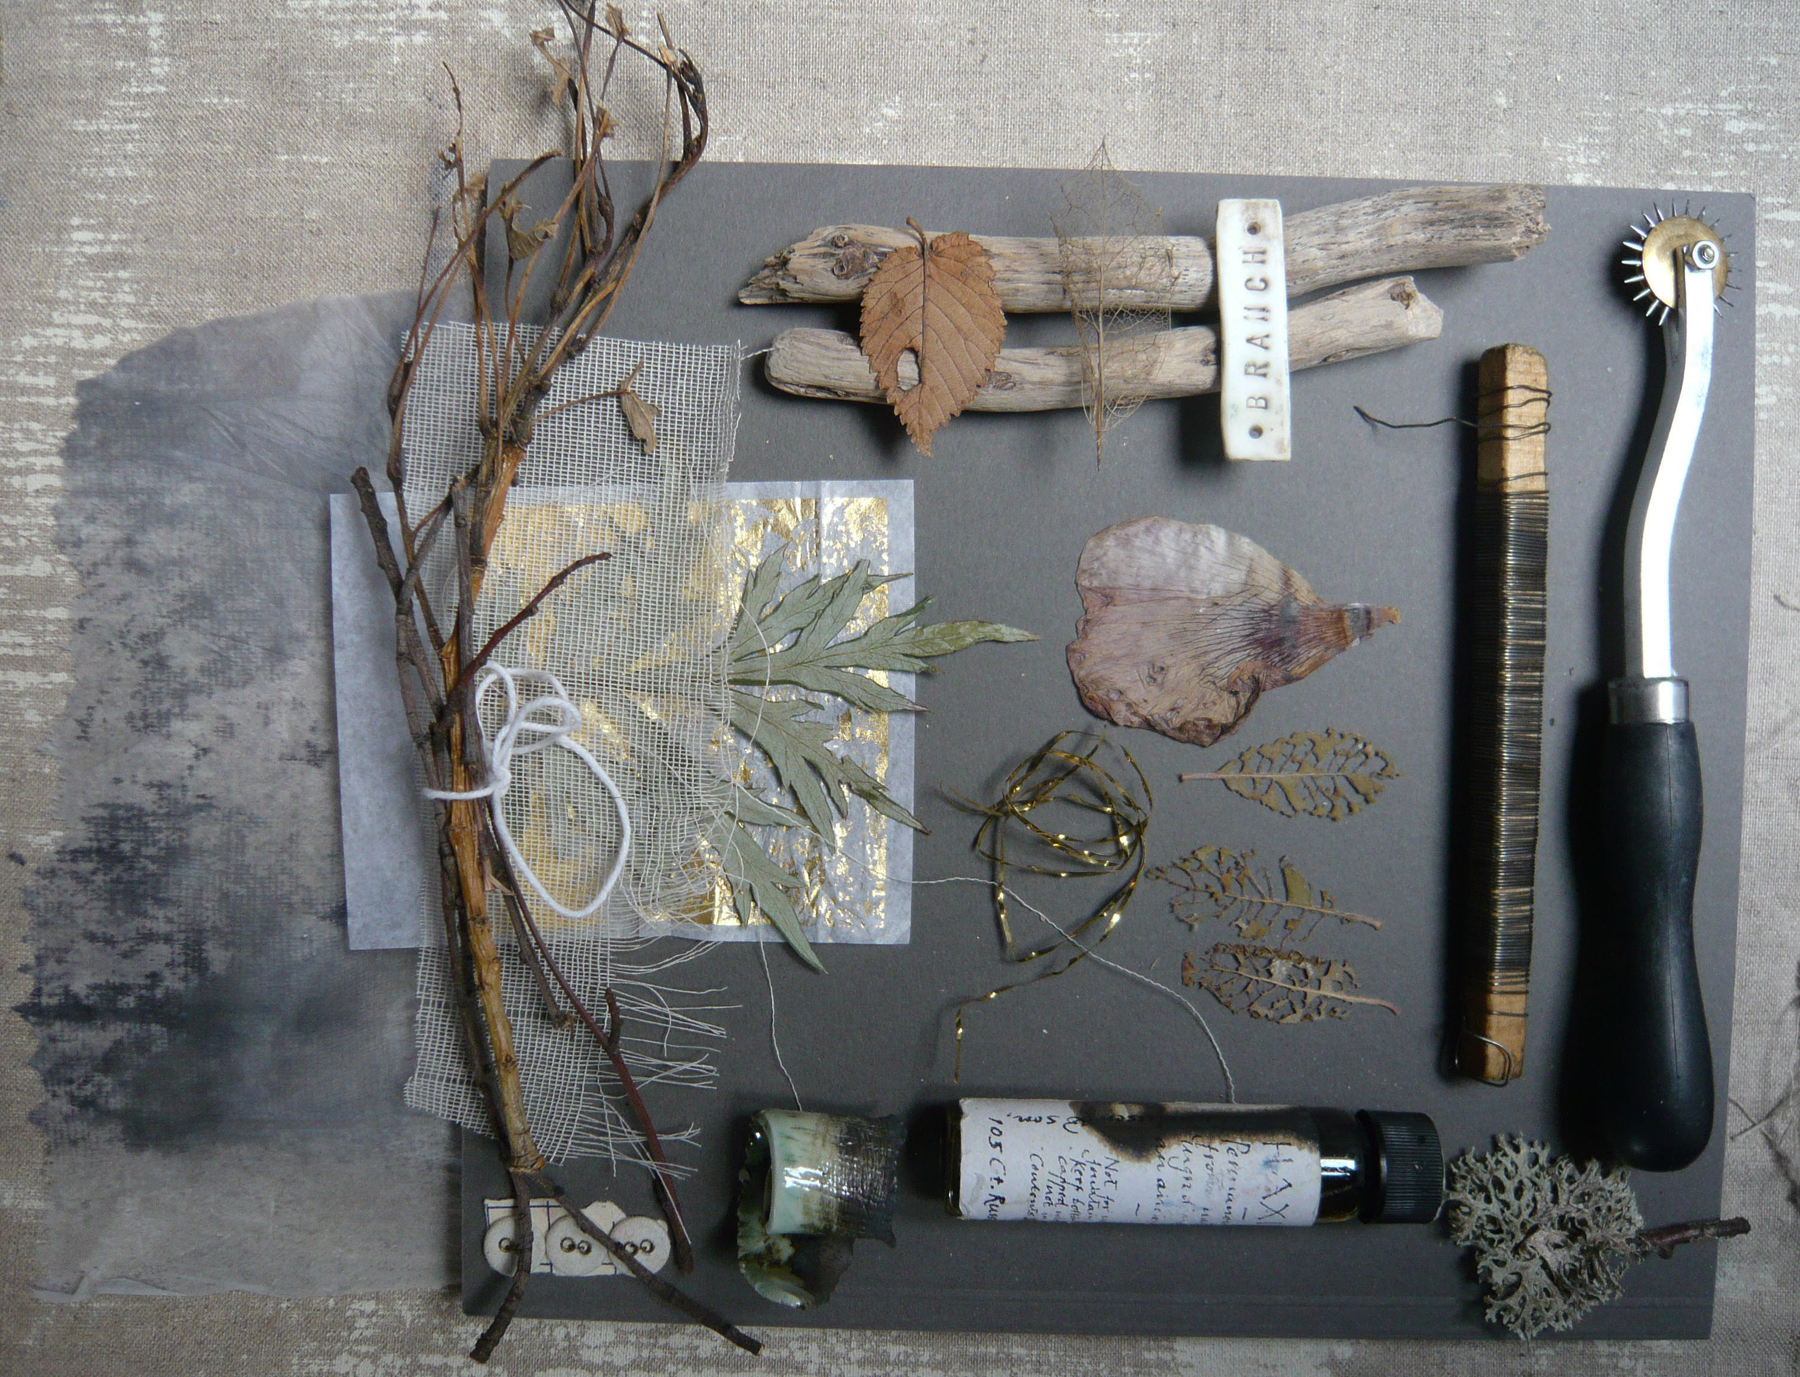 Poems & Plants Materials